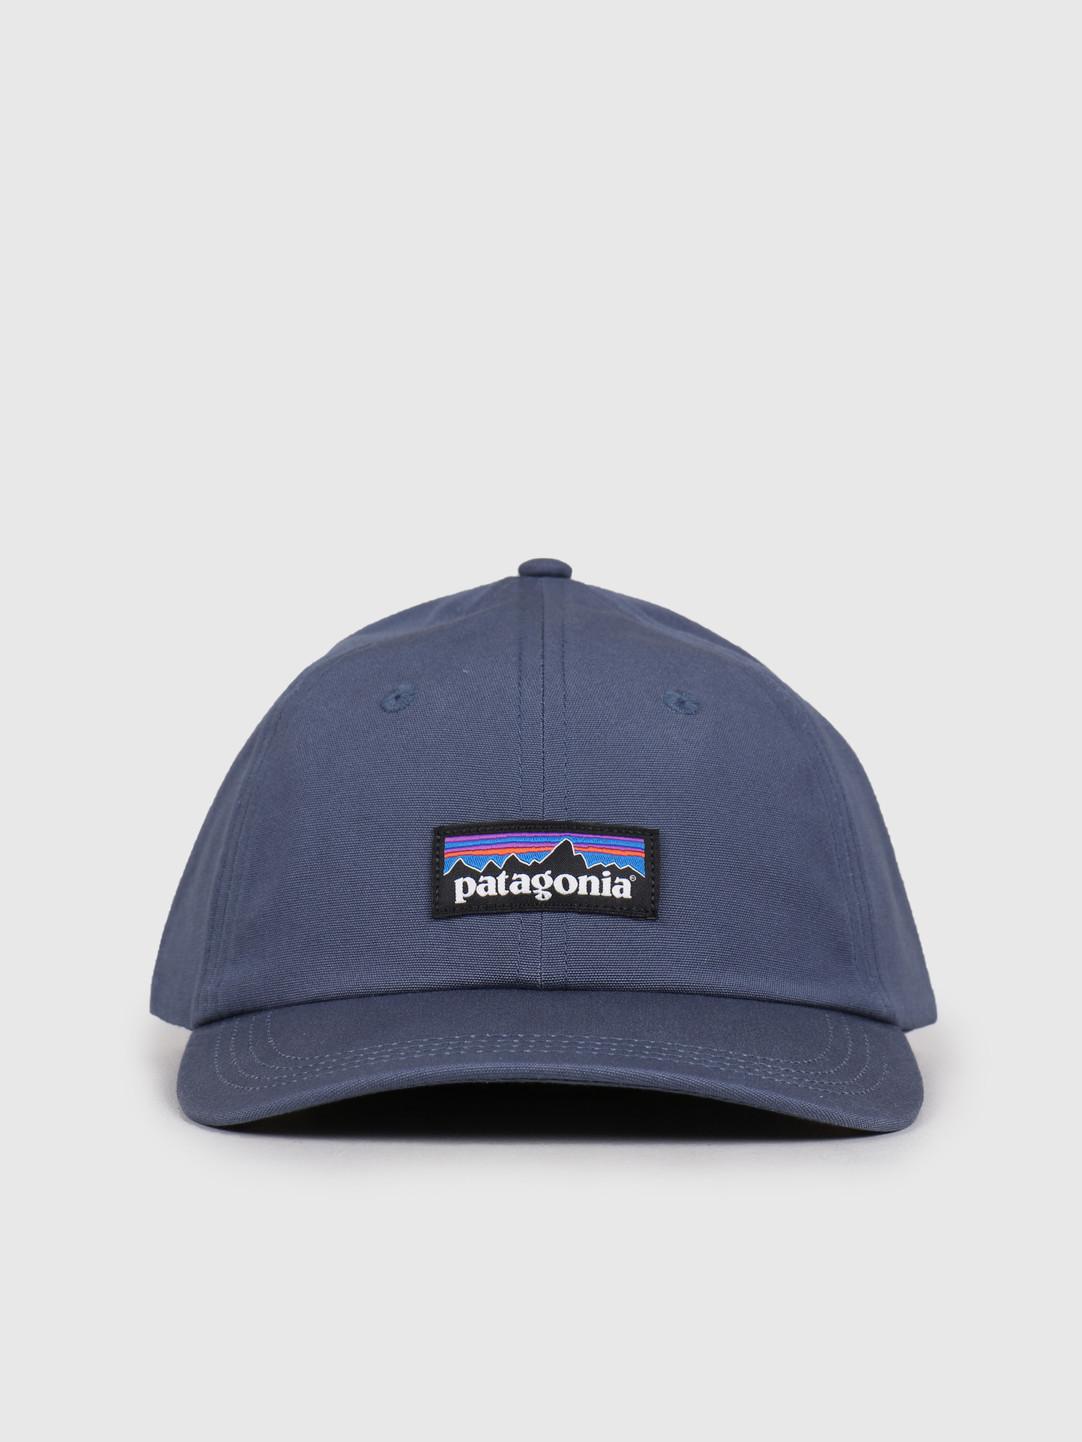 Patagonia Patagonia P-6 Label Trad Cap Dolomite Blue 38296